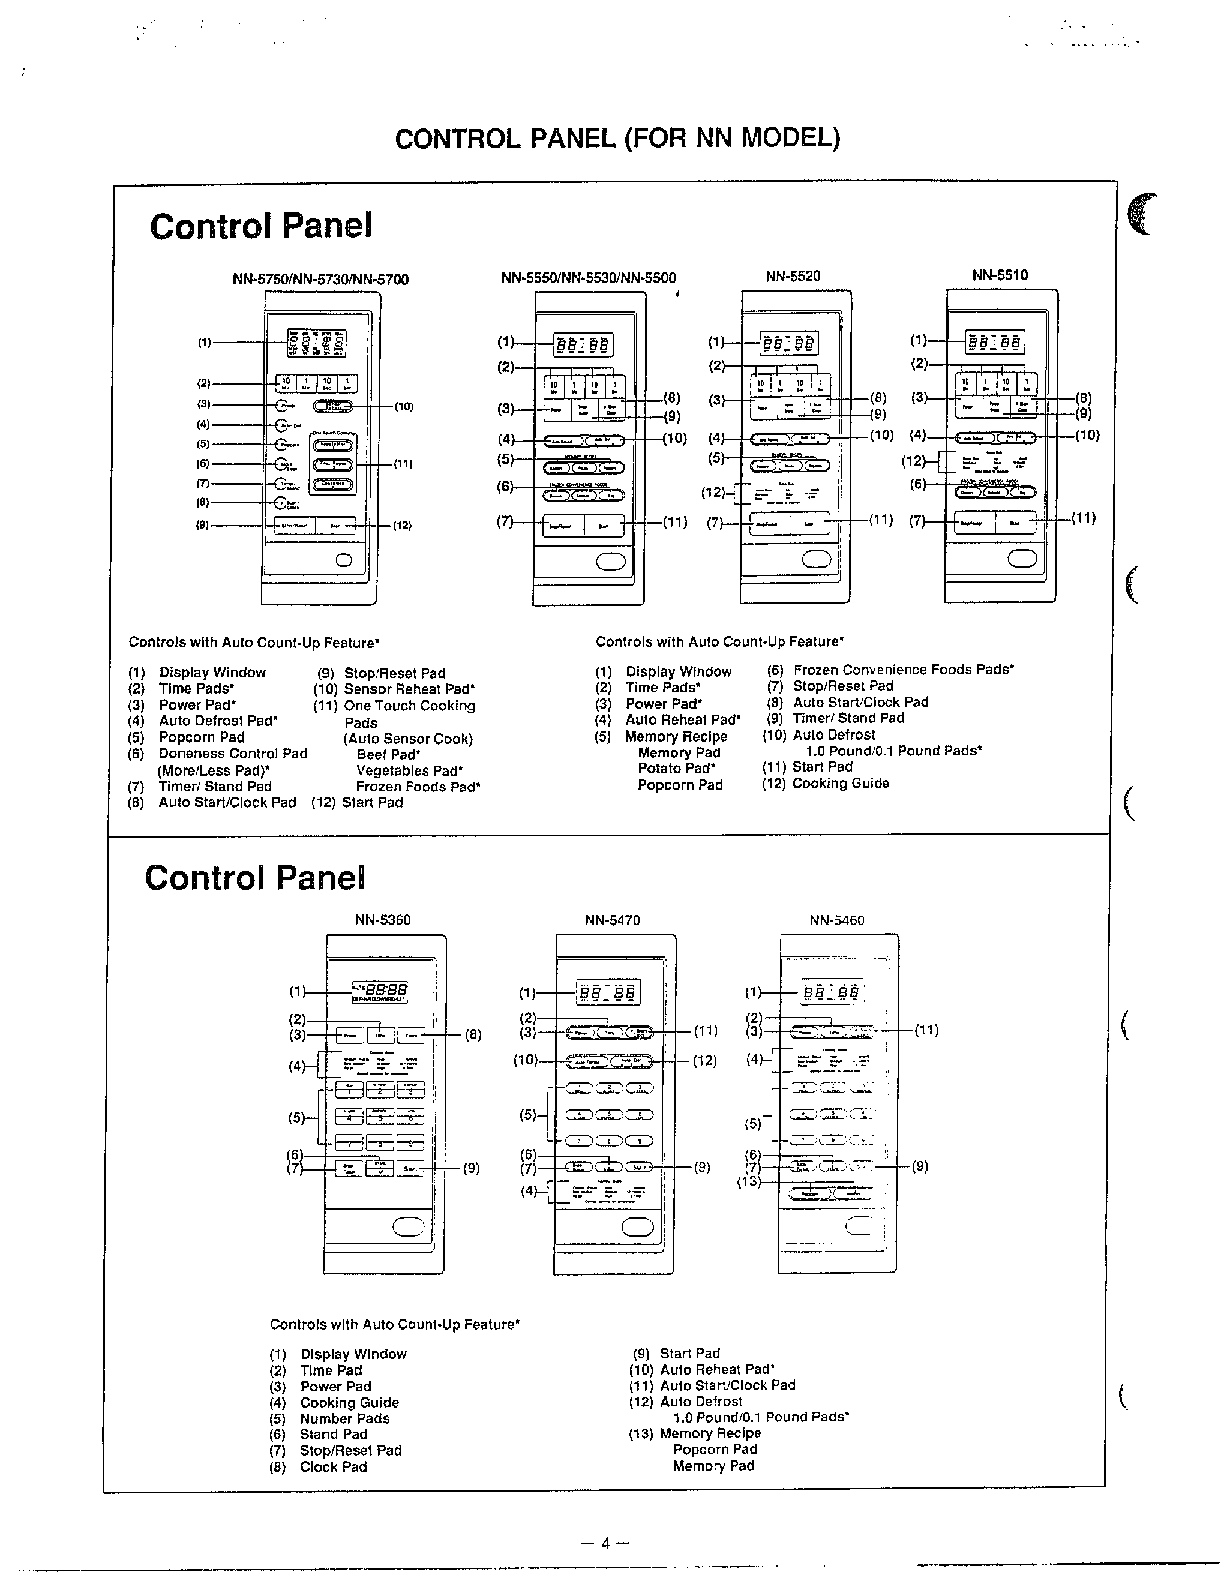 2006 Duramax Ficm Wiring Diagram